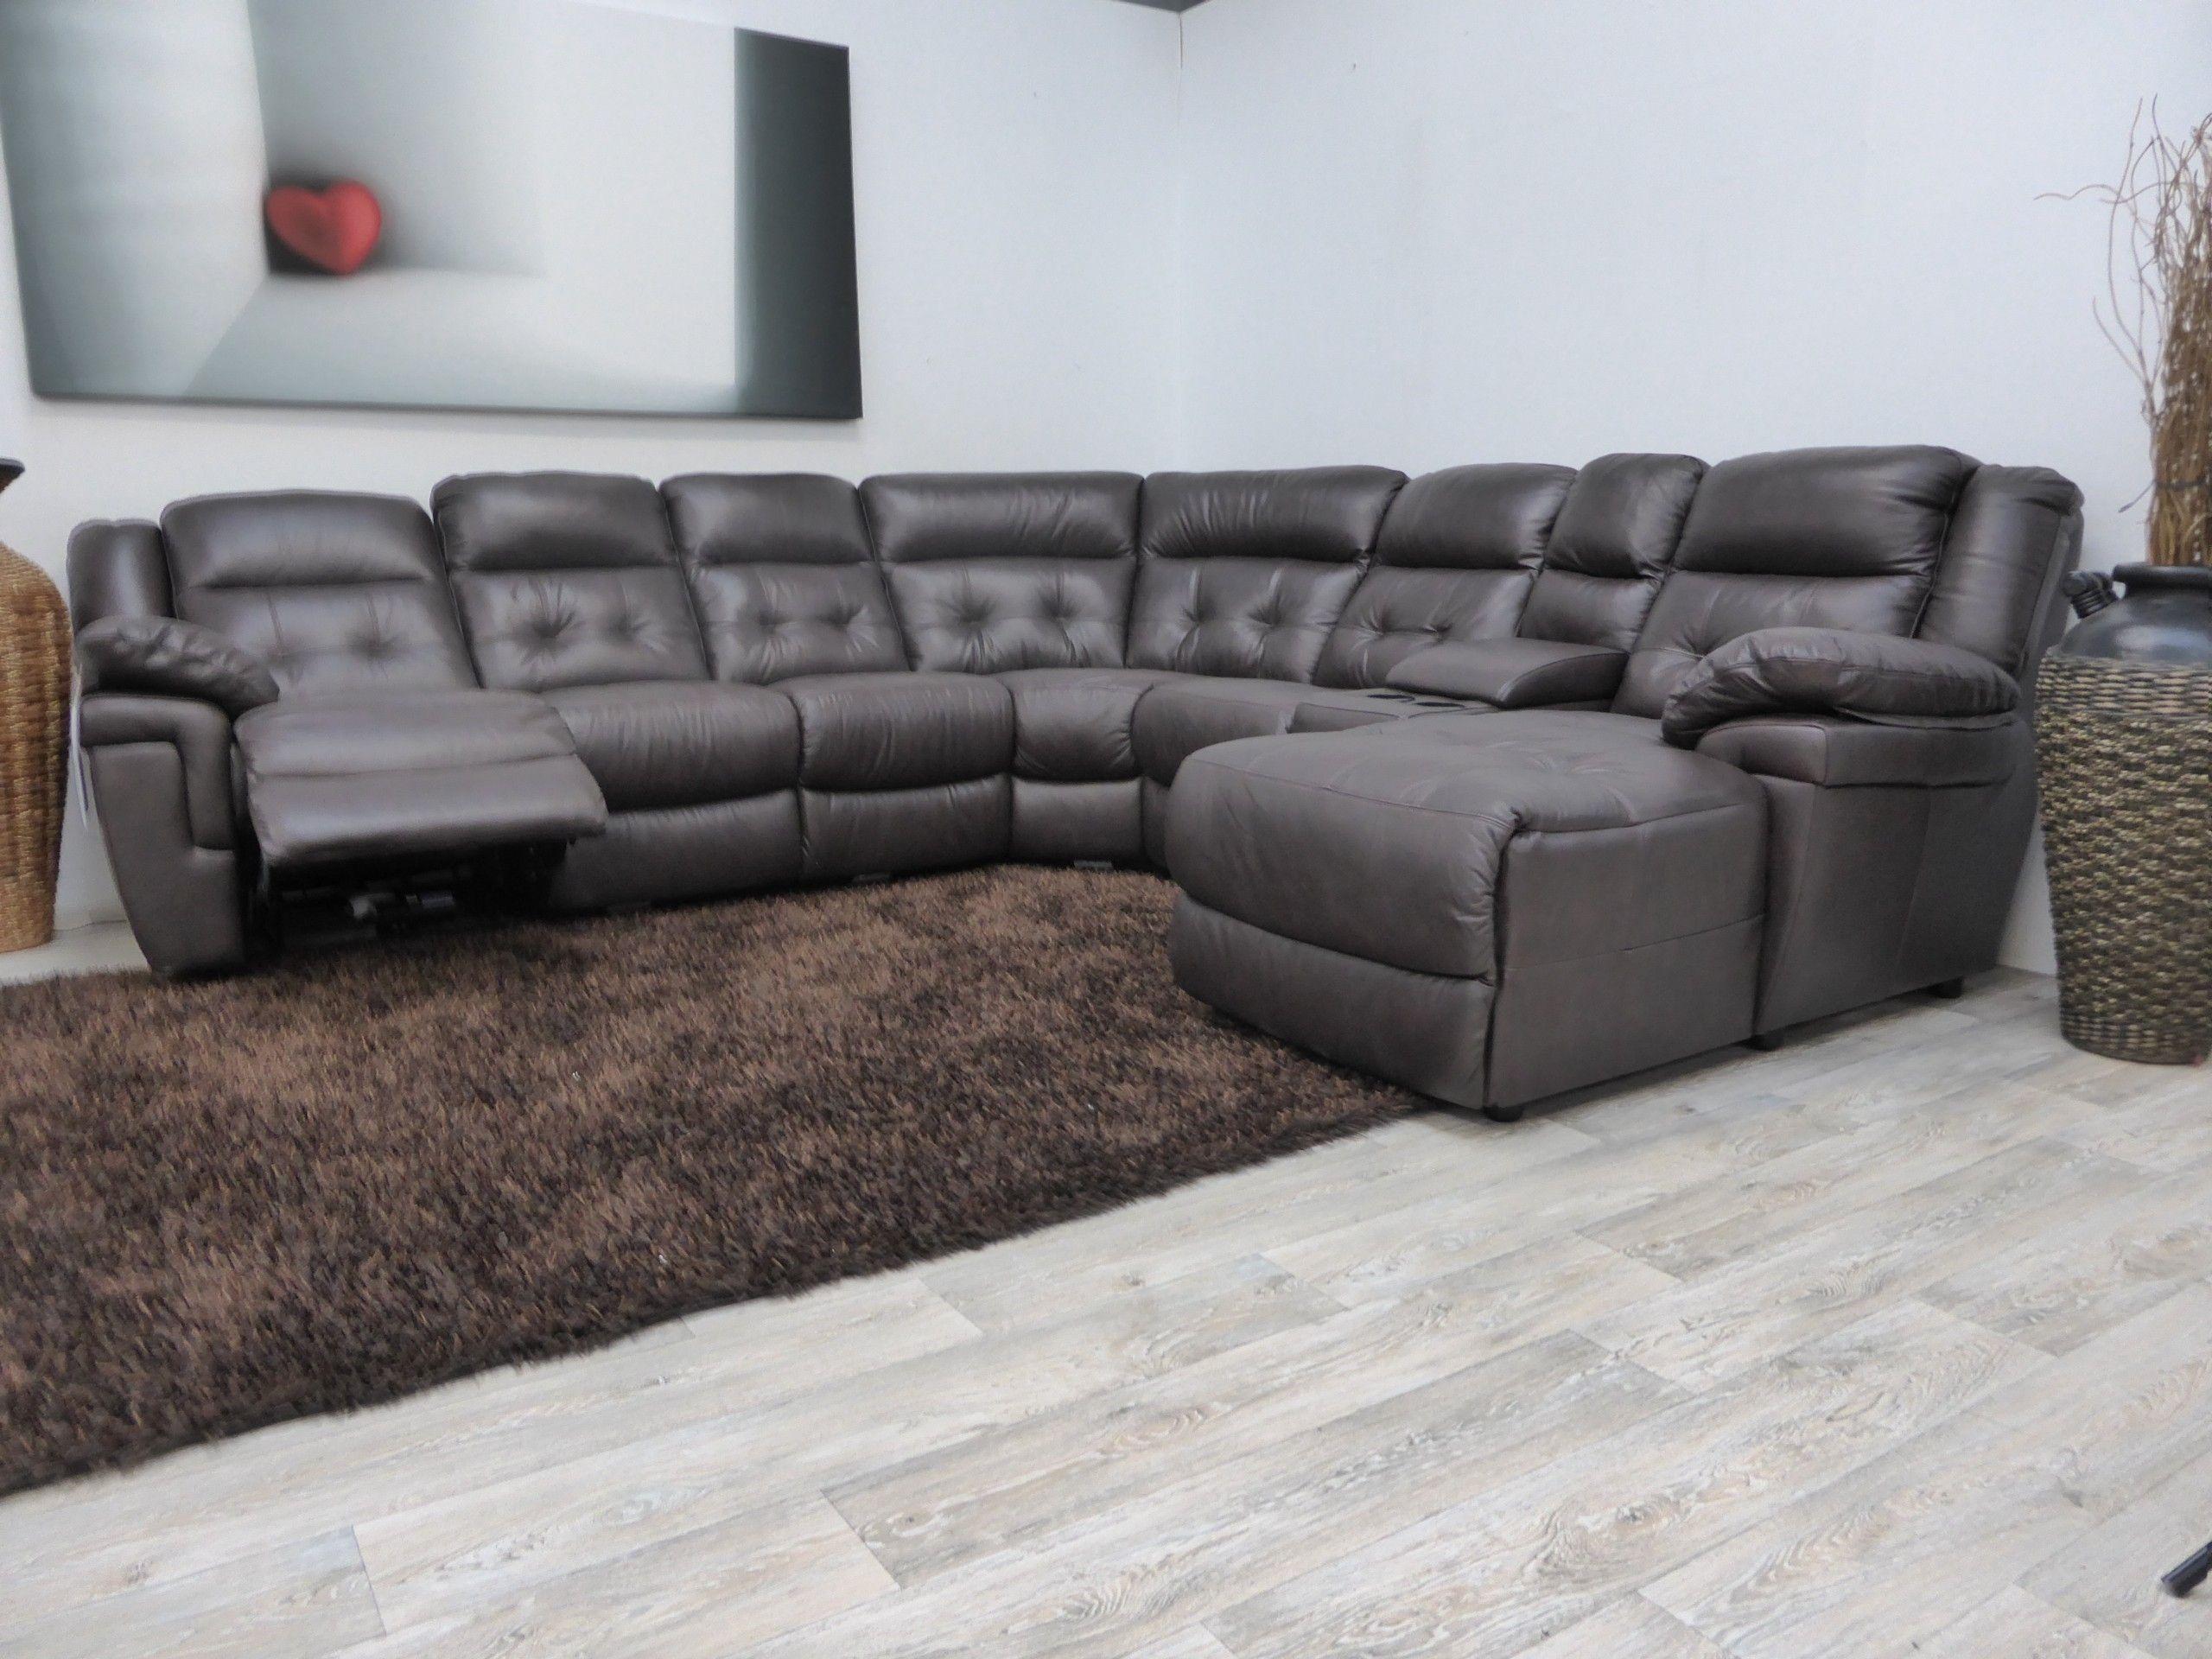 HLT Gray Leather Sectional Furniture Pinterest